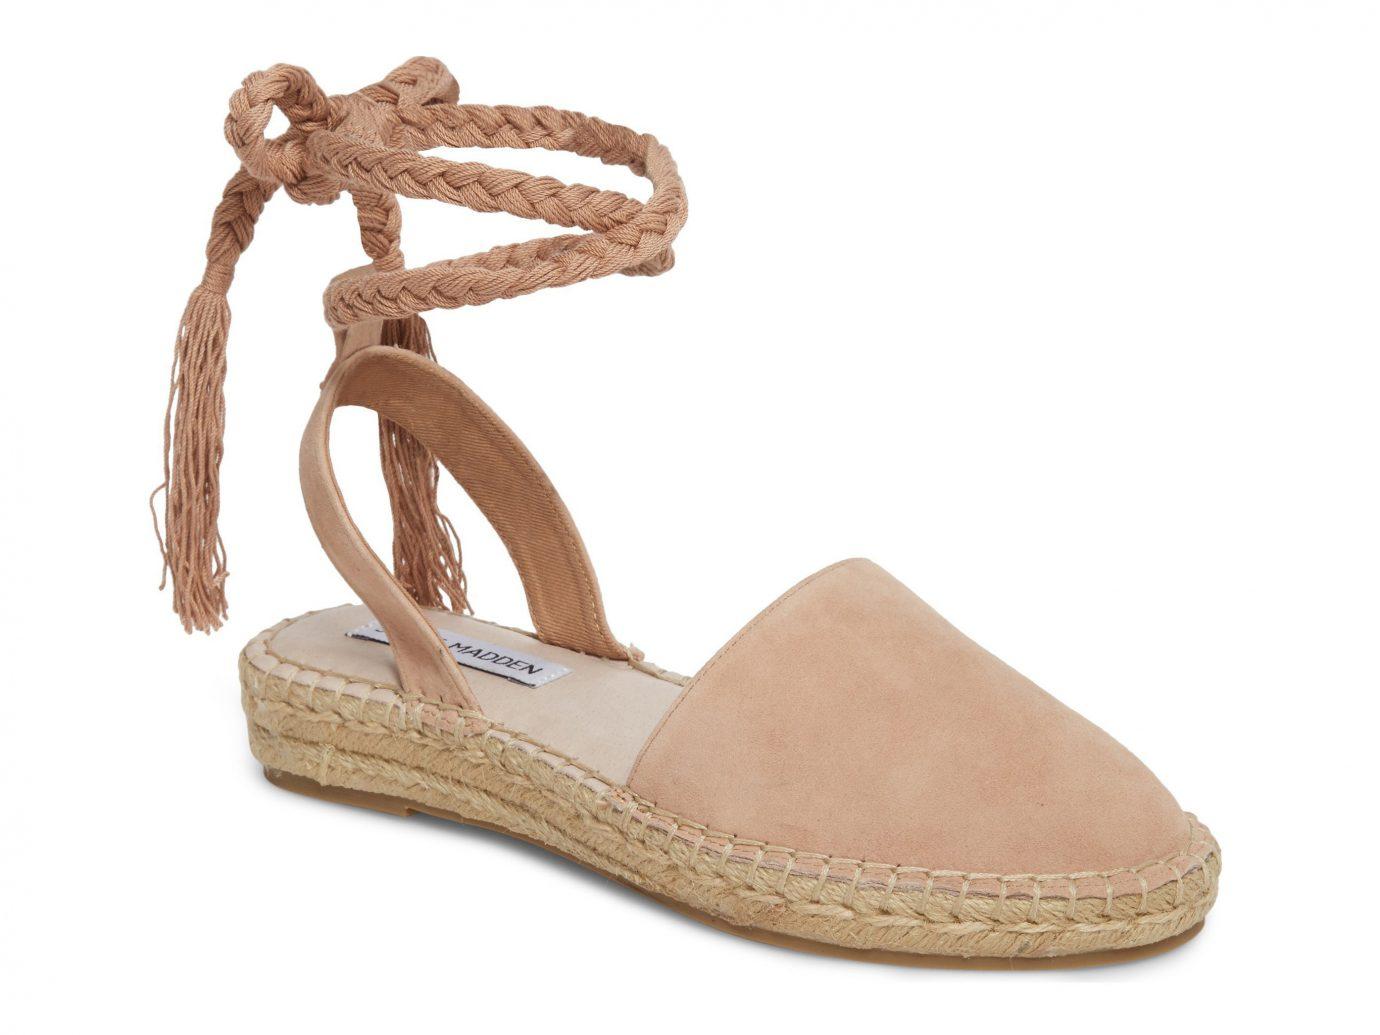 Trip Ideas footwear shoe sandal beige outdoor shoe product shoes product design feet tan